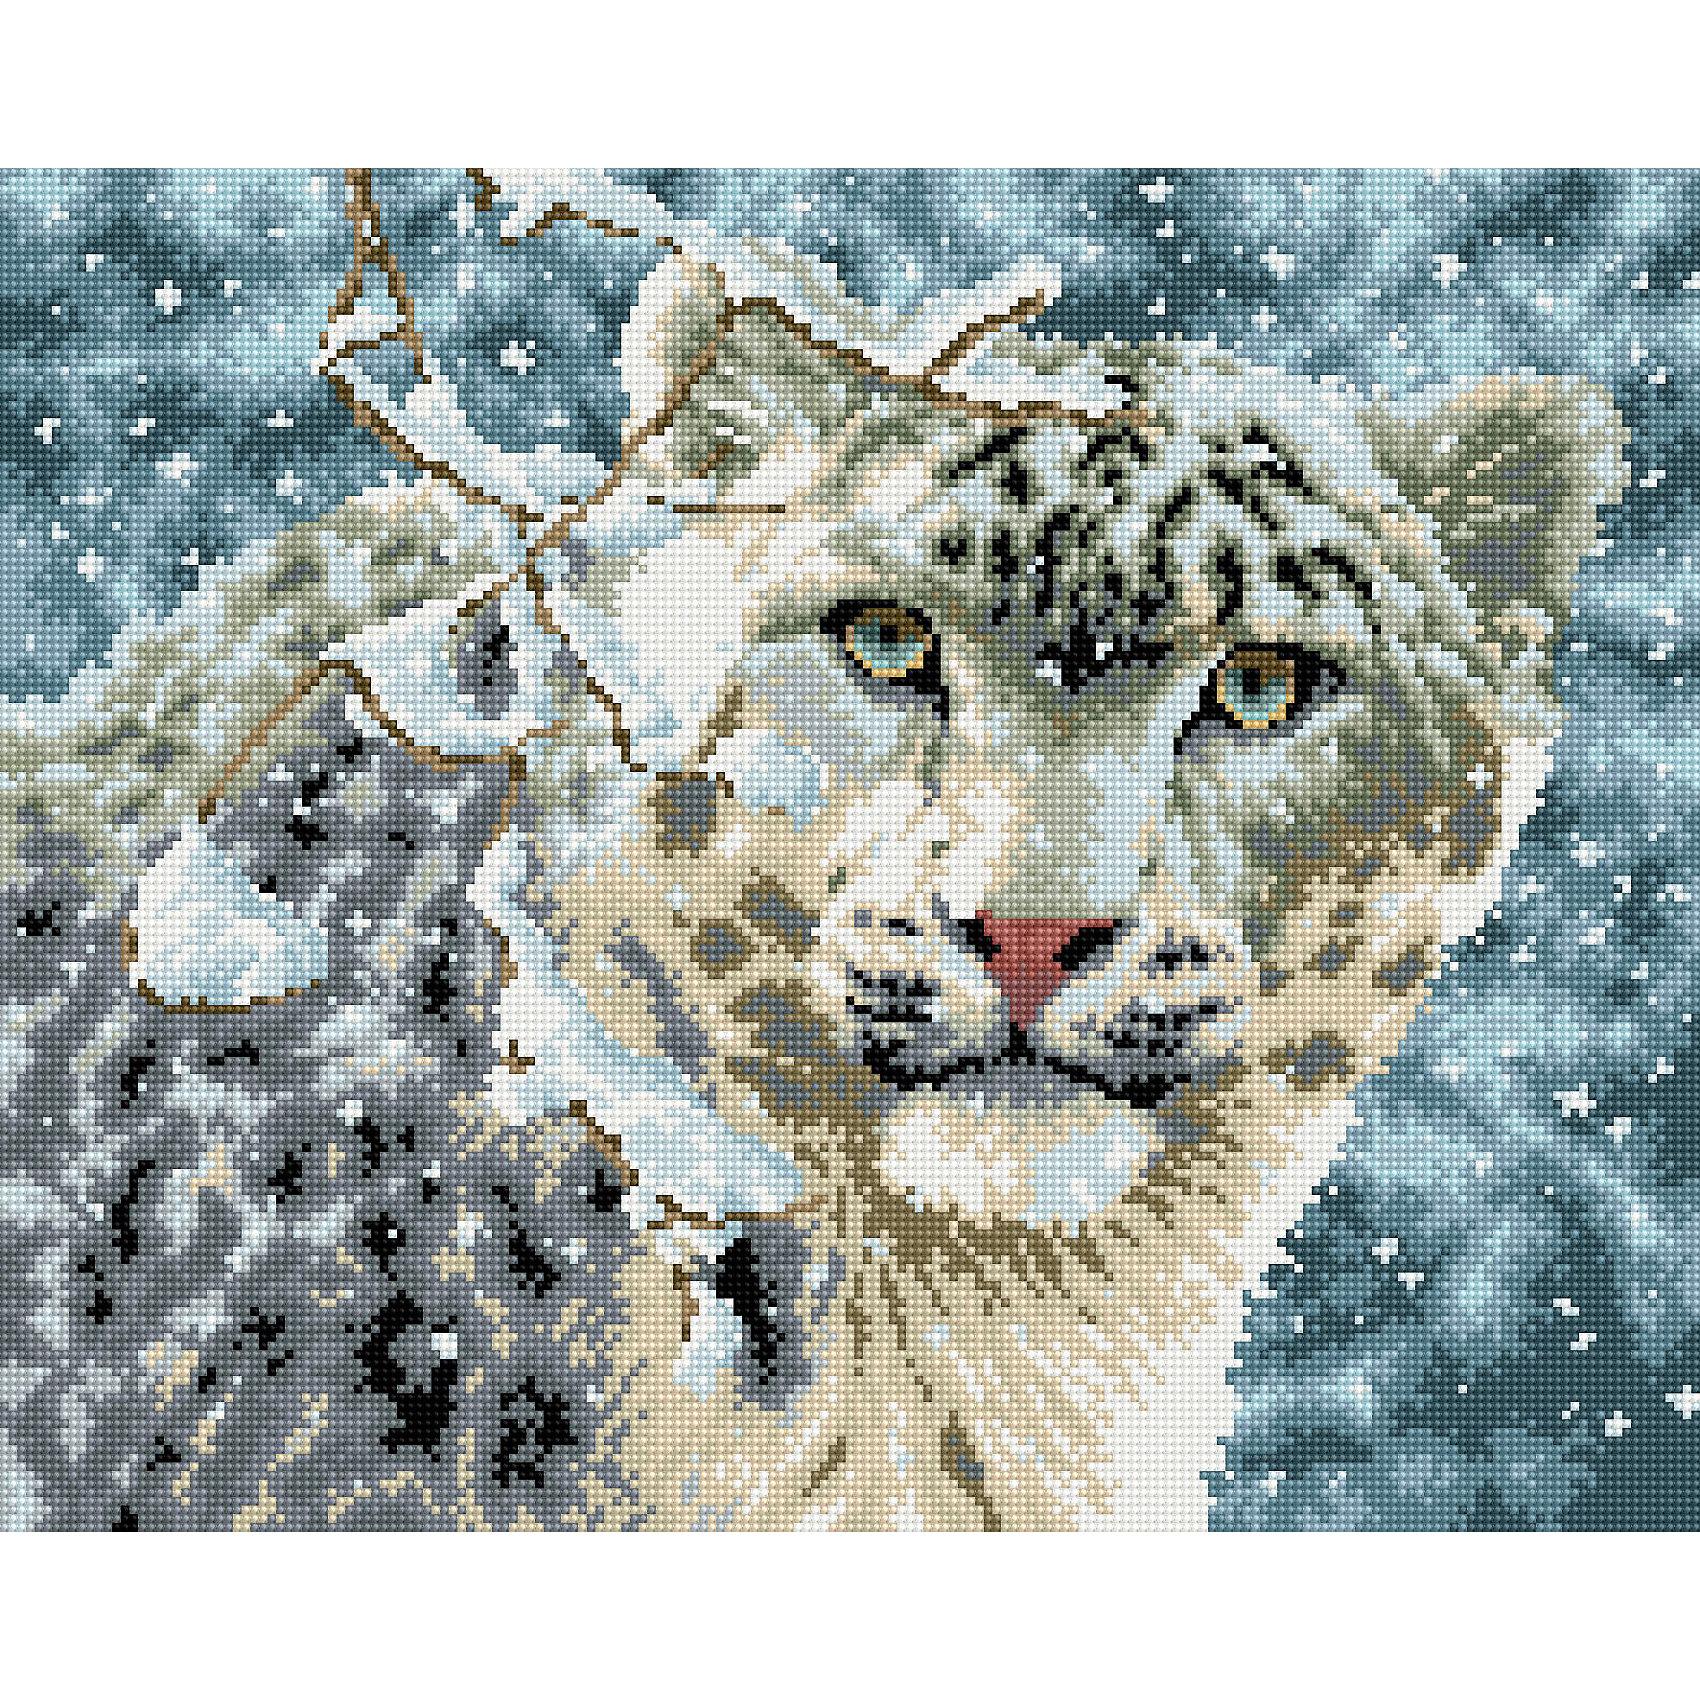 TUKZAR Алмазная мозаика Снежный барс 40*50 см наборы для поделок цветной алмазная мозаика парусник